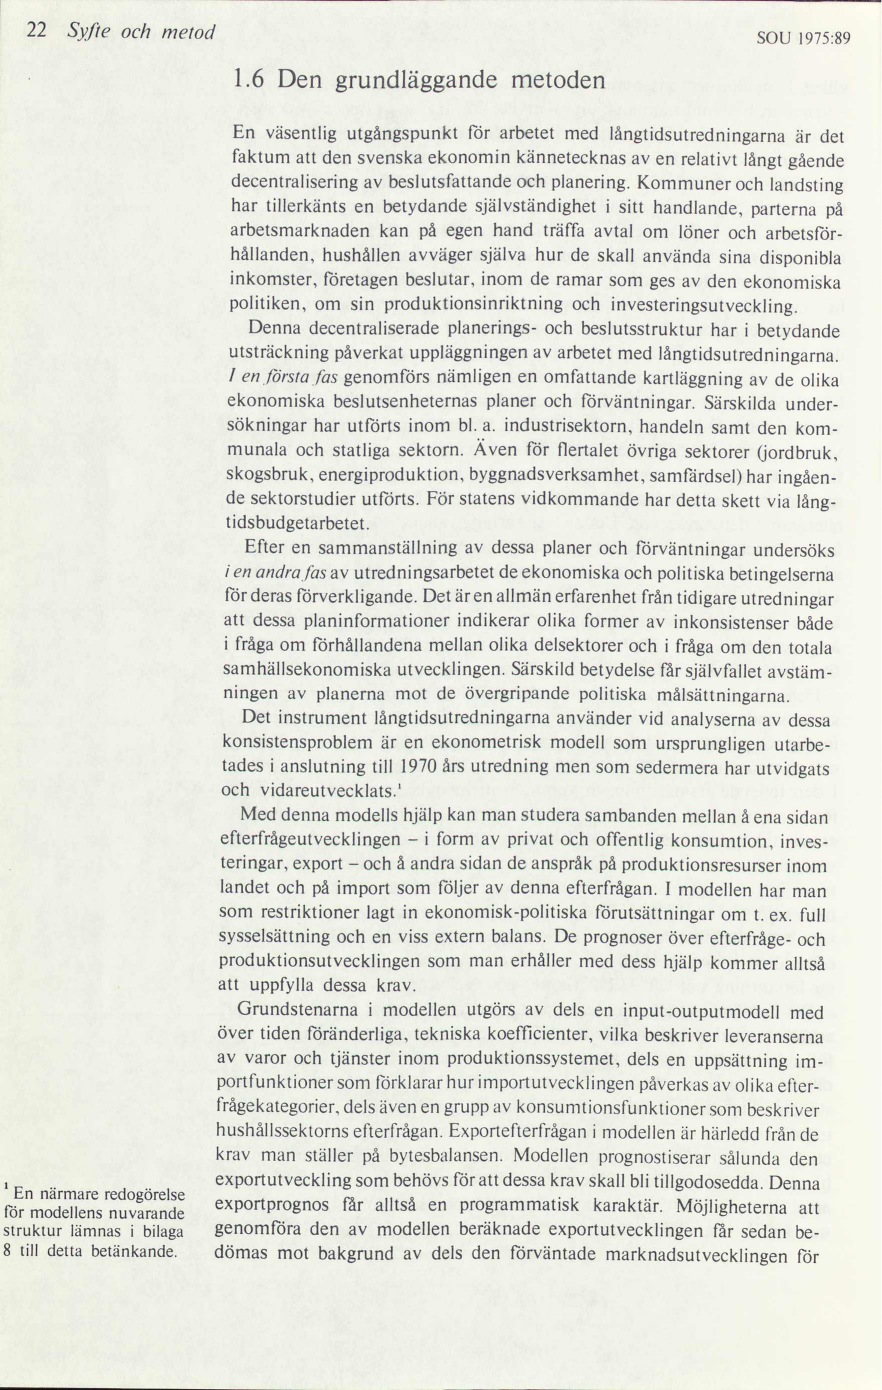 Fn narmare kompromiss jugoslavien suspenderas